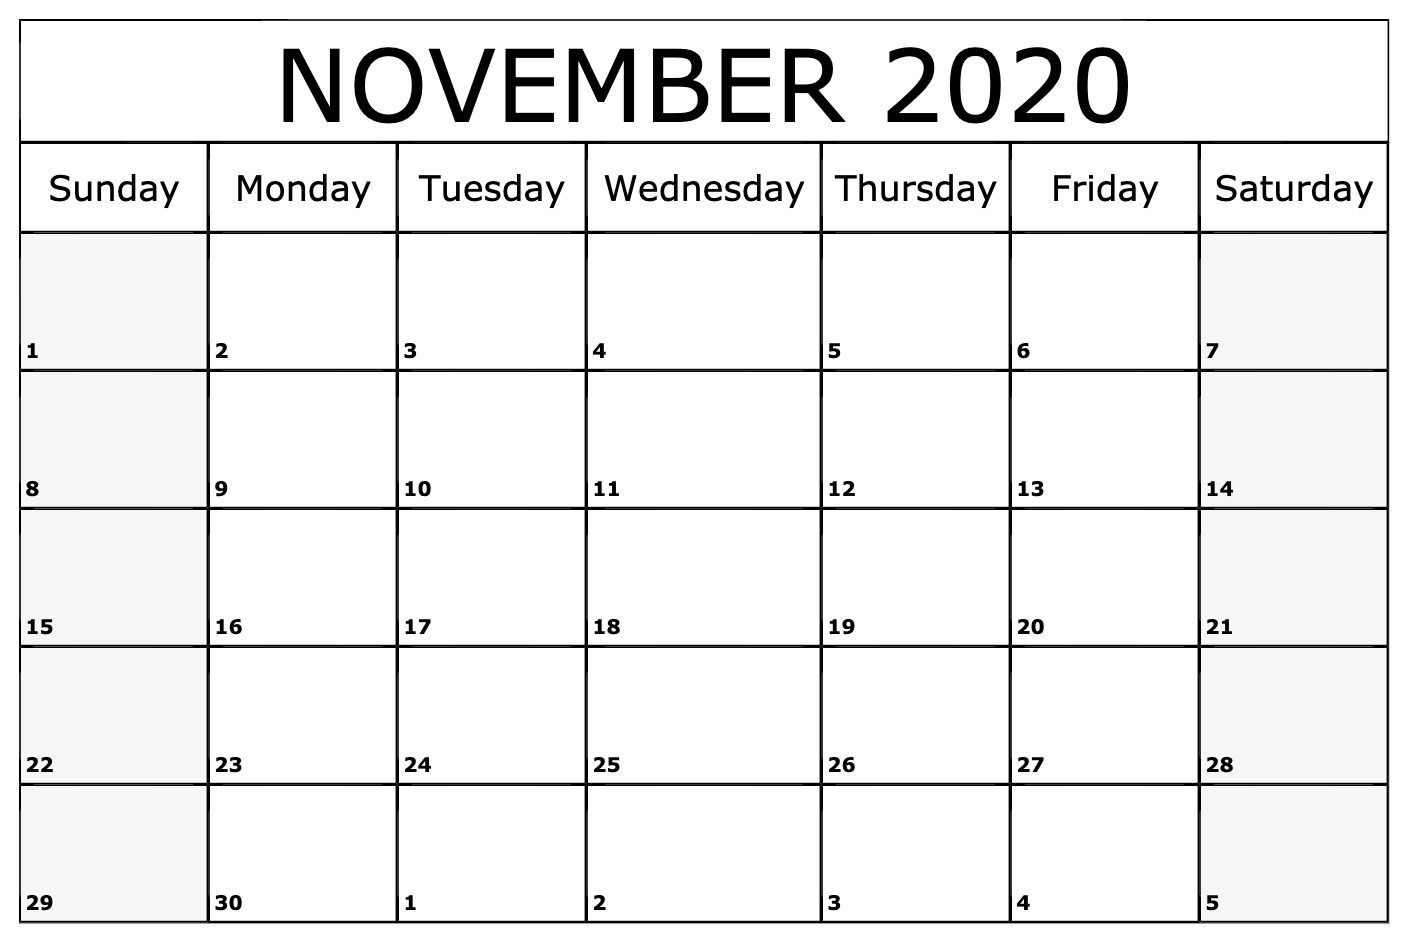 November 2020 Calendar Wallpapers - Top Free November 2020 Free Calendar Background Templates